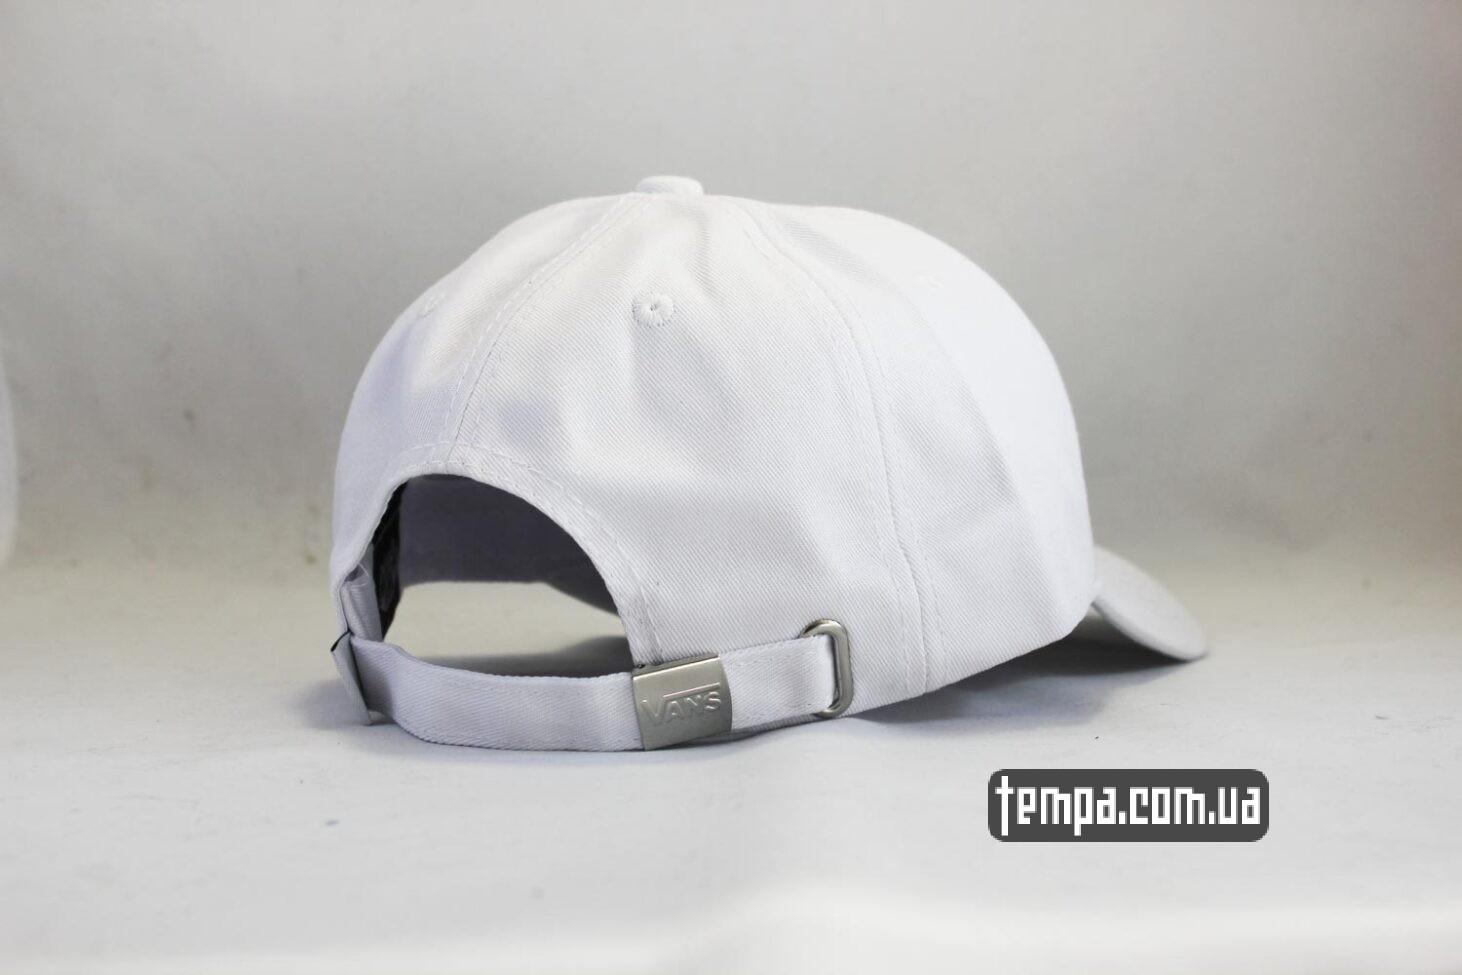 vans white кепка VANS белая snapback VANS OFF THE WALL купить